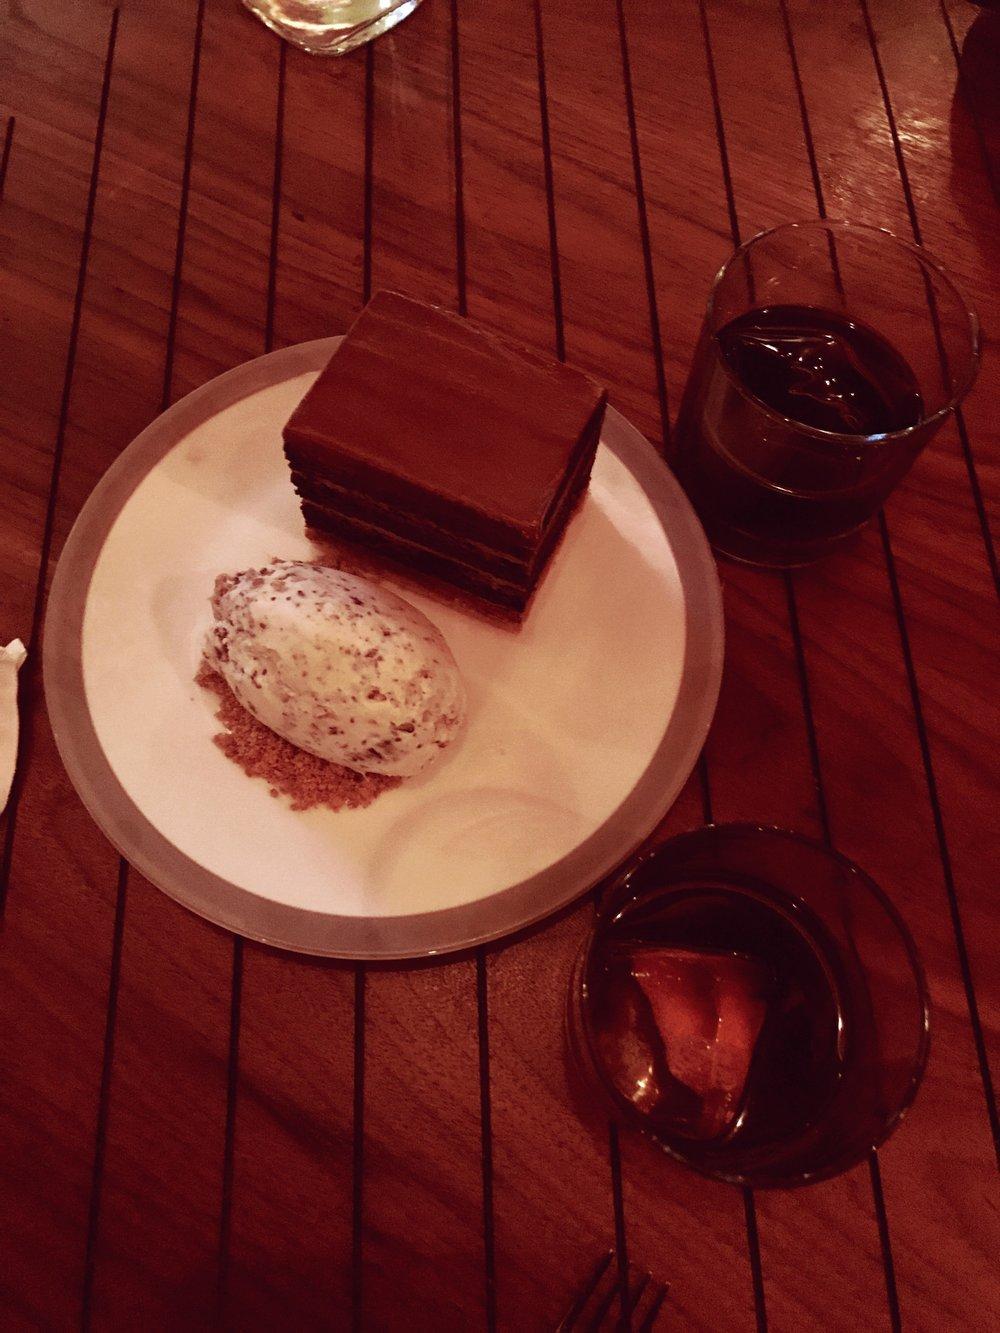 Charcoal Venice Dessert.jpg